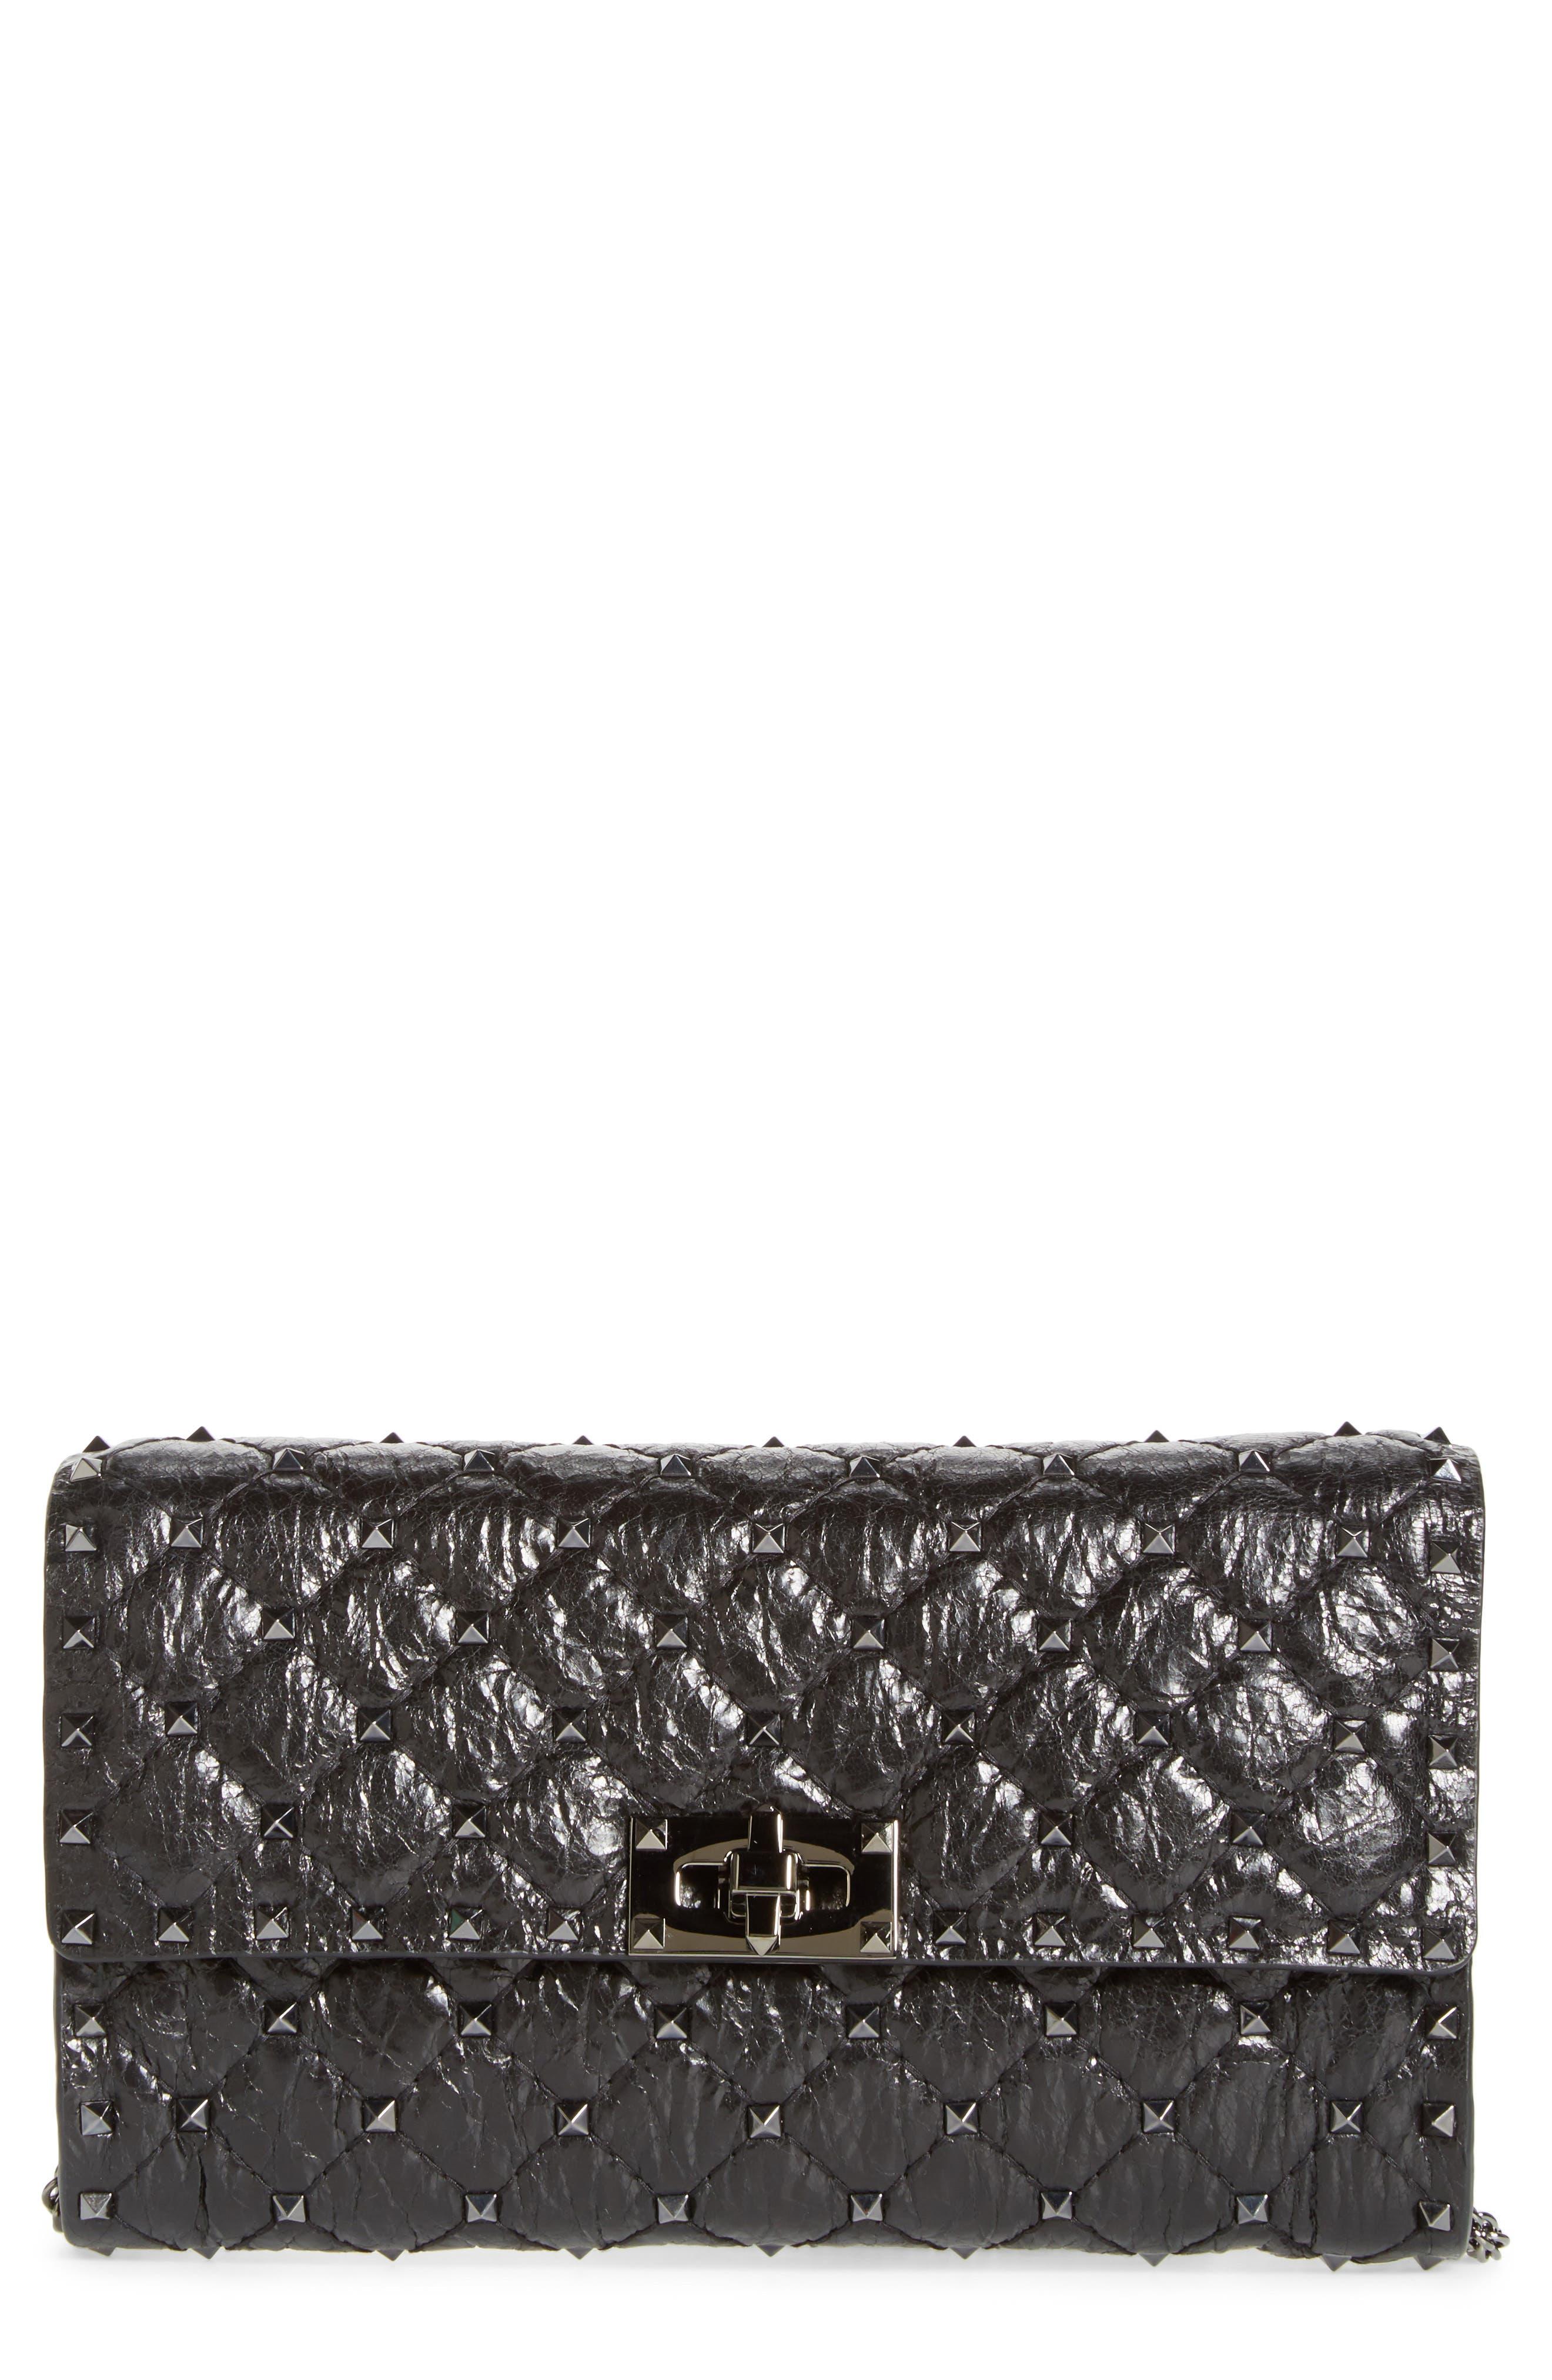 Alternate Image 1 Selected - VALENTINO GARAVANI Matelassé Rockstud Spike Leather Wallet on a Chain